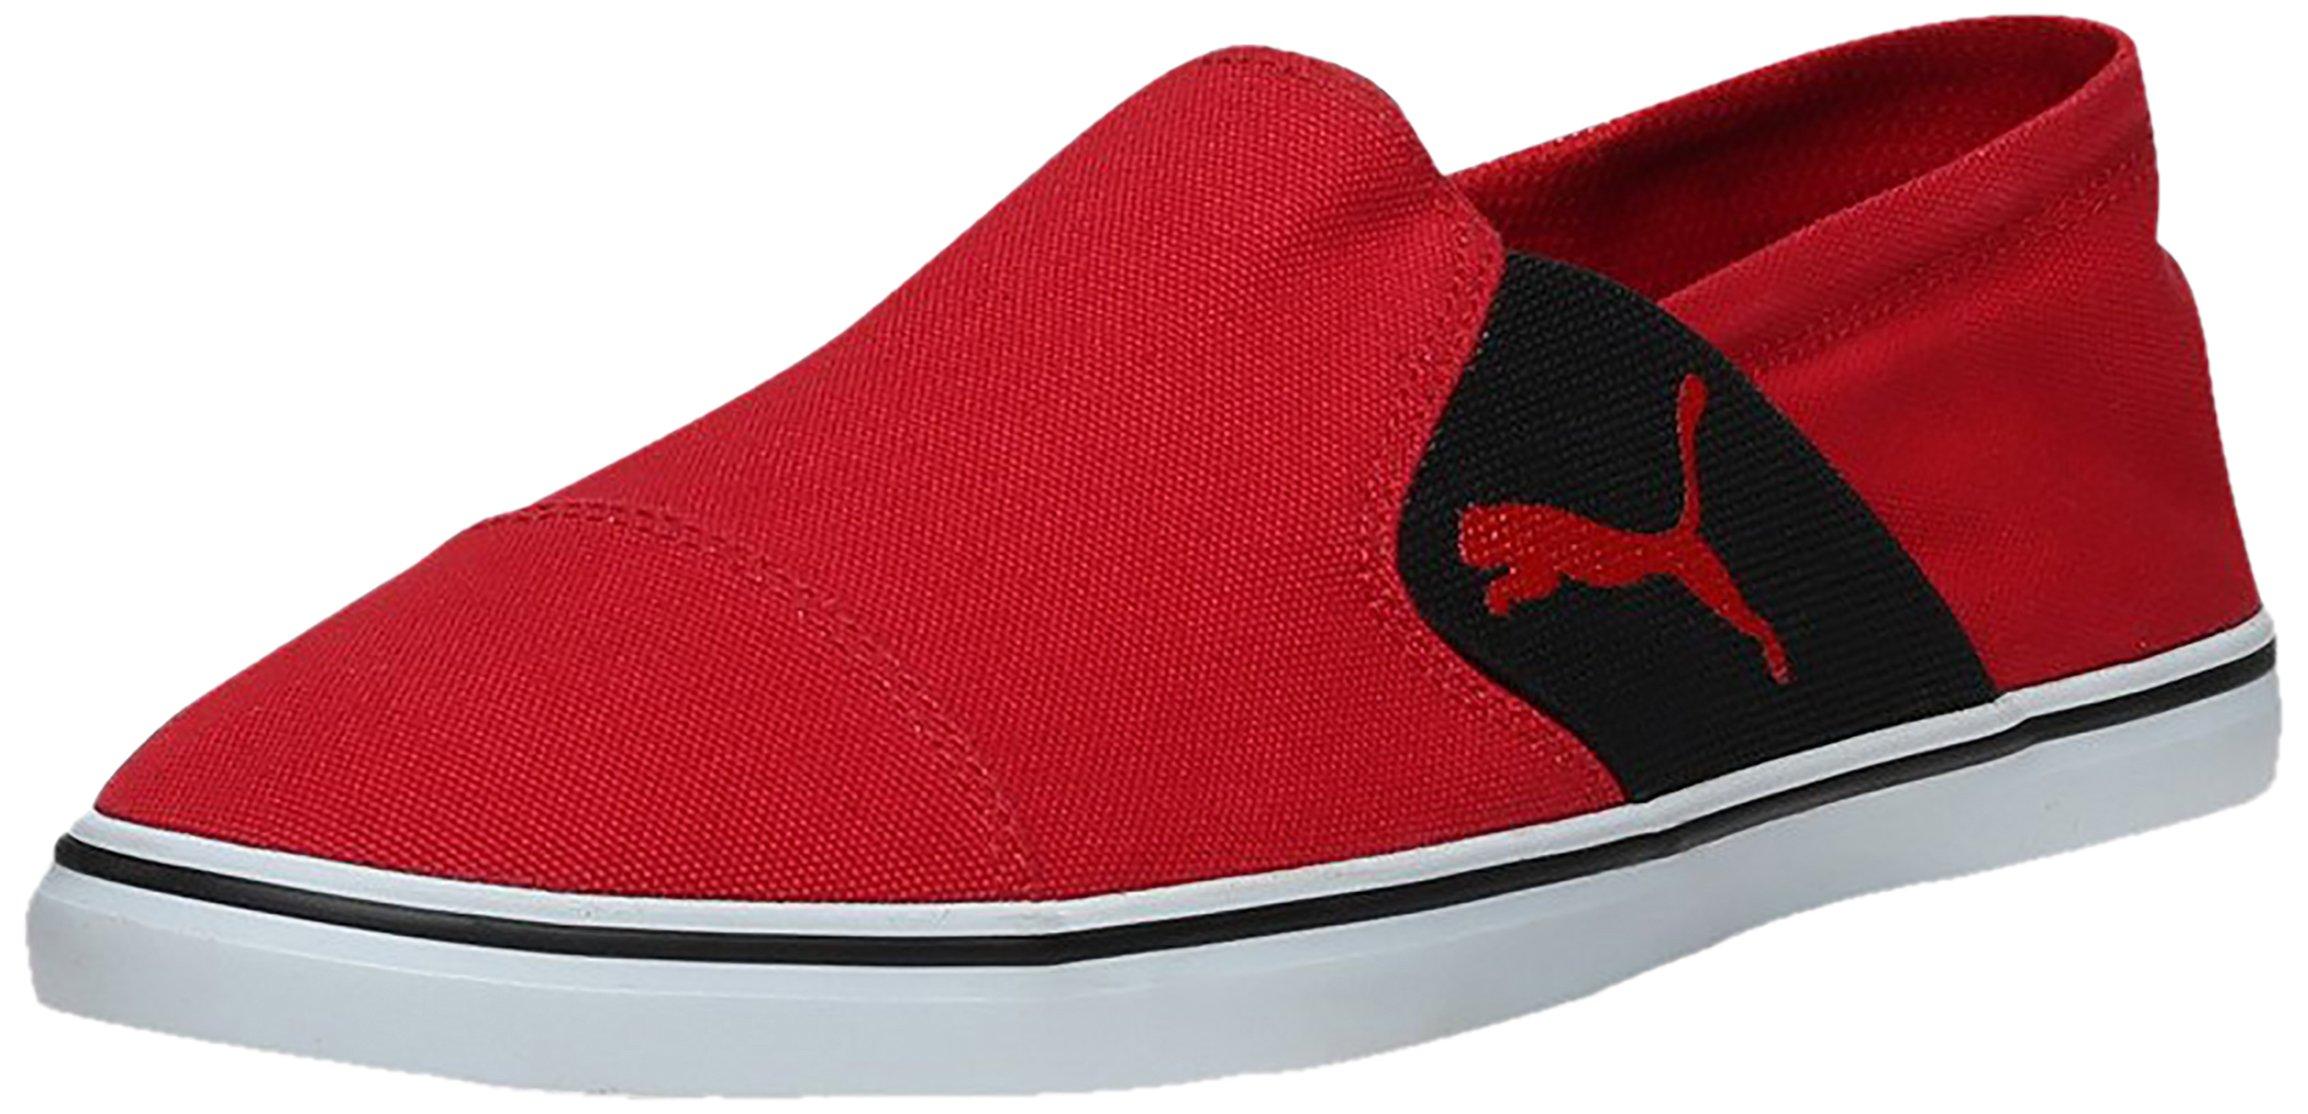 bdb6ebf43a0b3a Shop Men s Collection Puma Men s Elsu V2 Slip On Idp Loafers and Moccasins.  prev next. slide 1 of 4